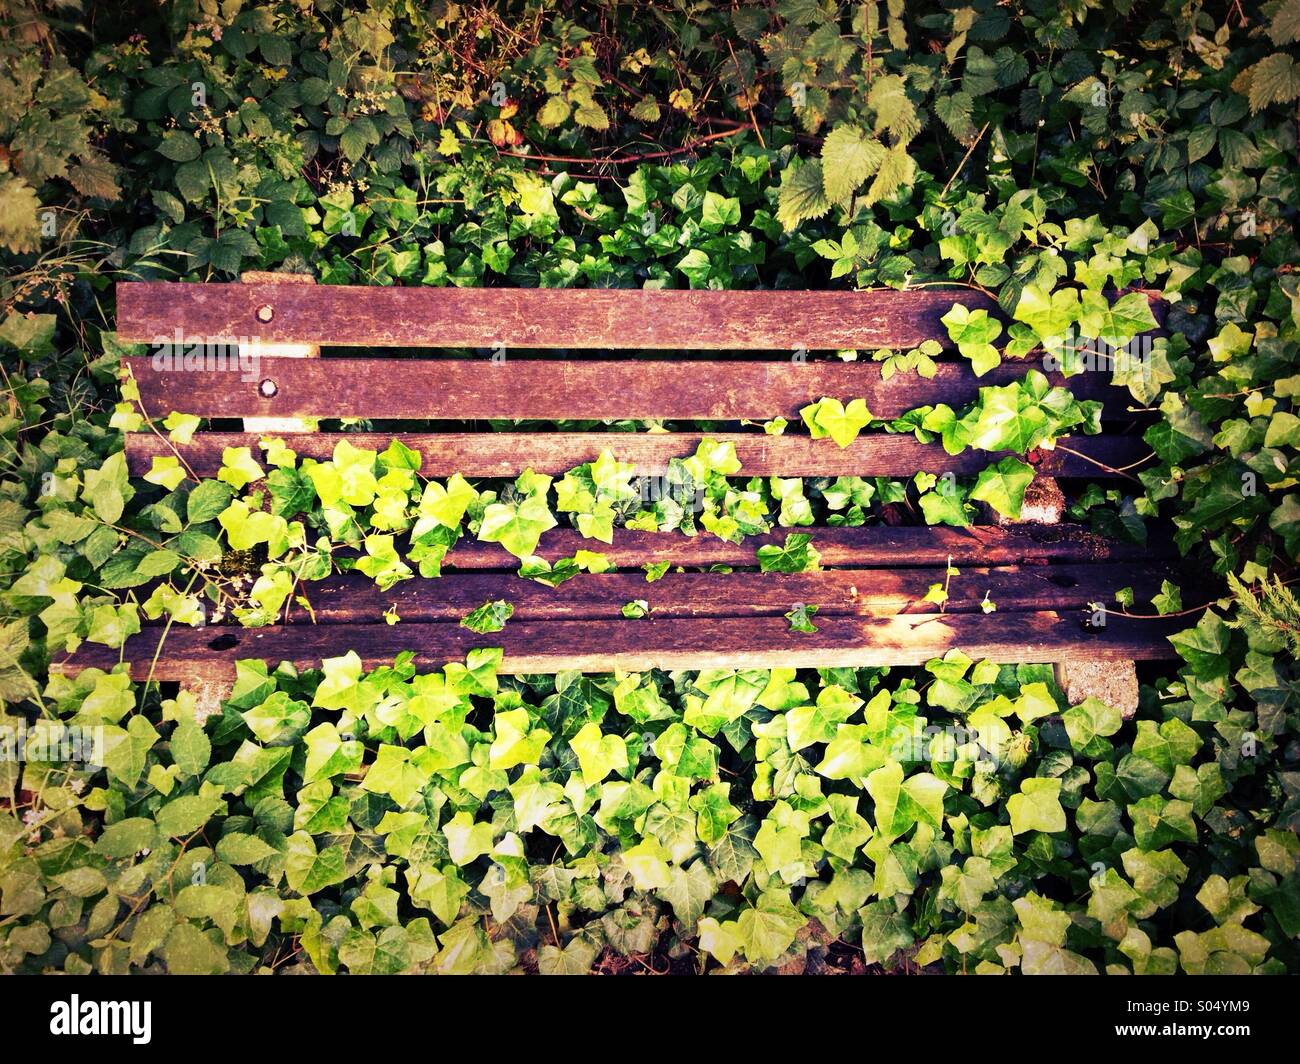 Overgrown bench - Stock Image